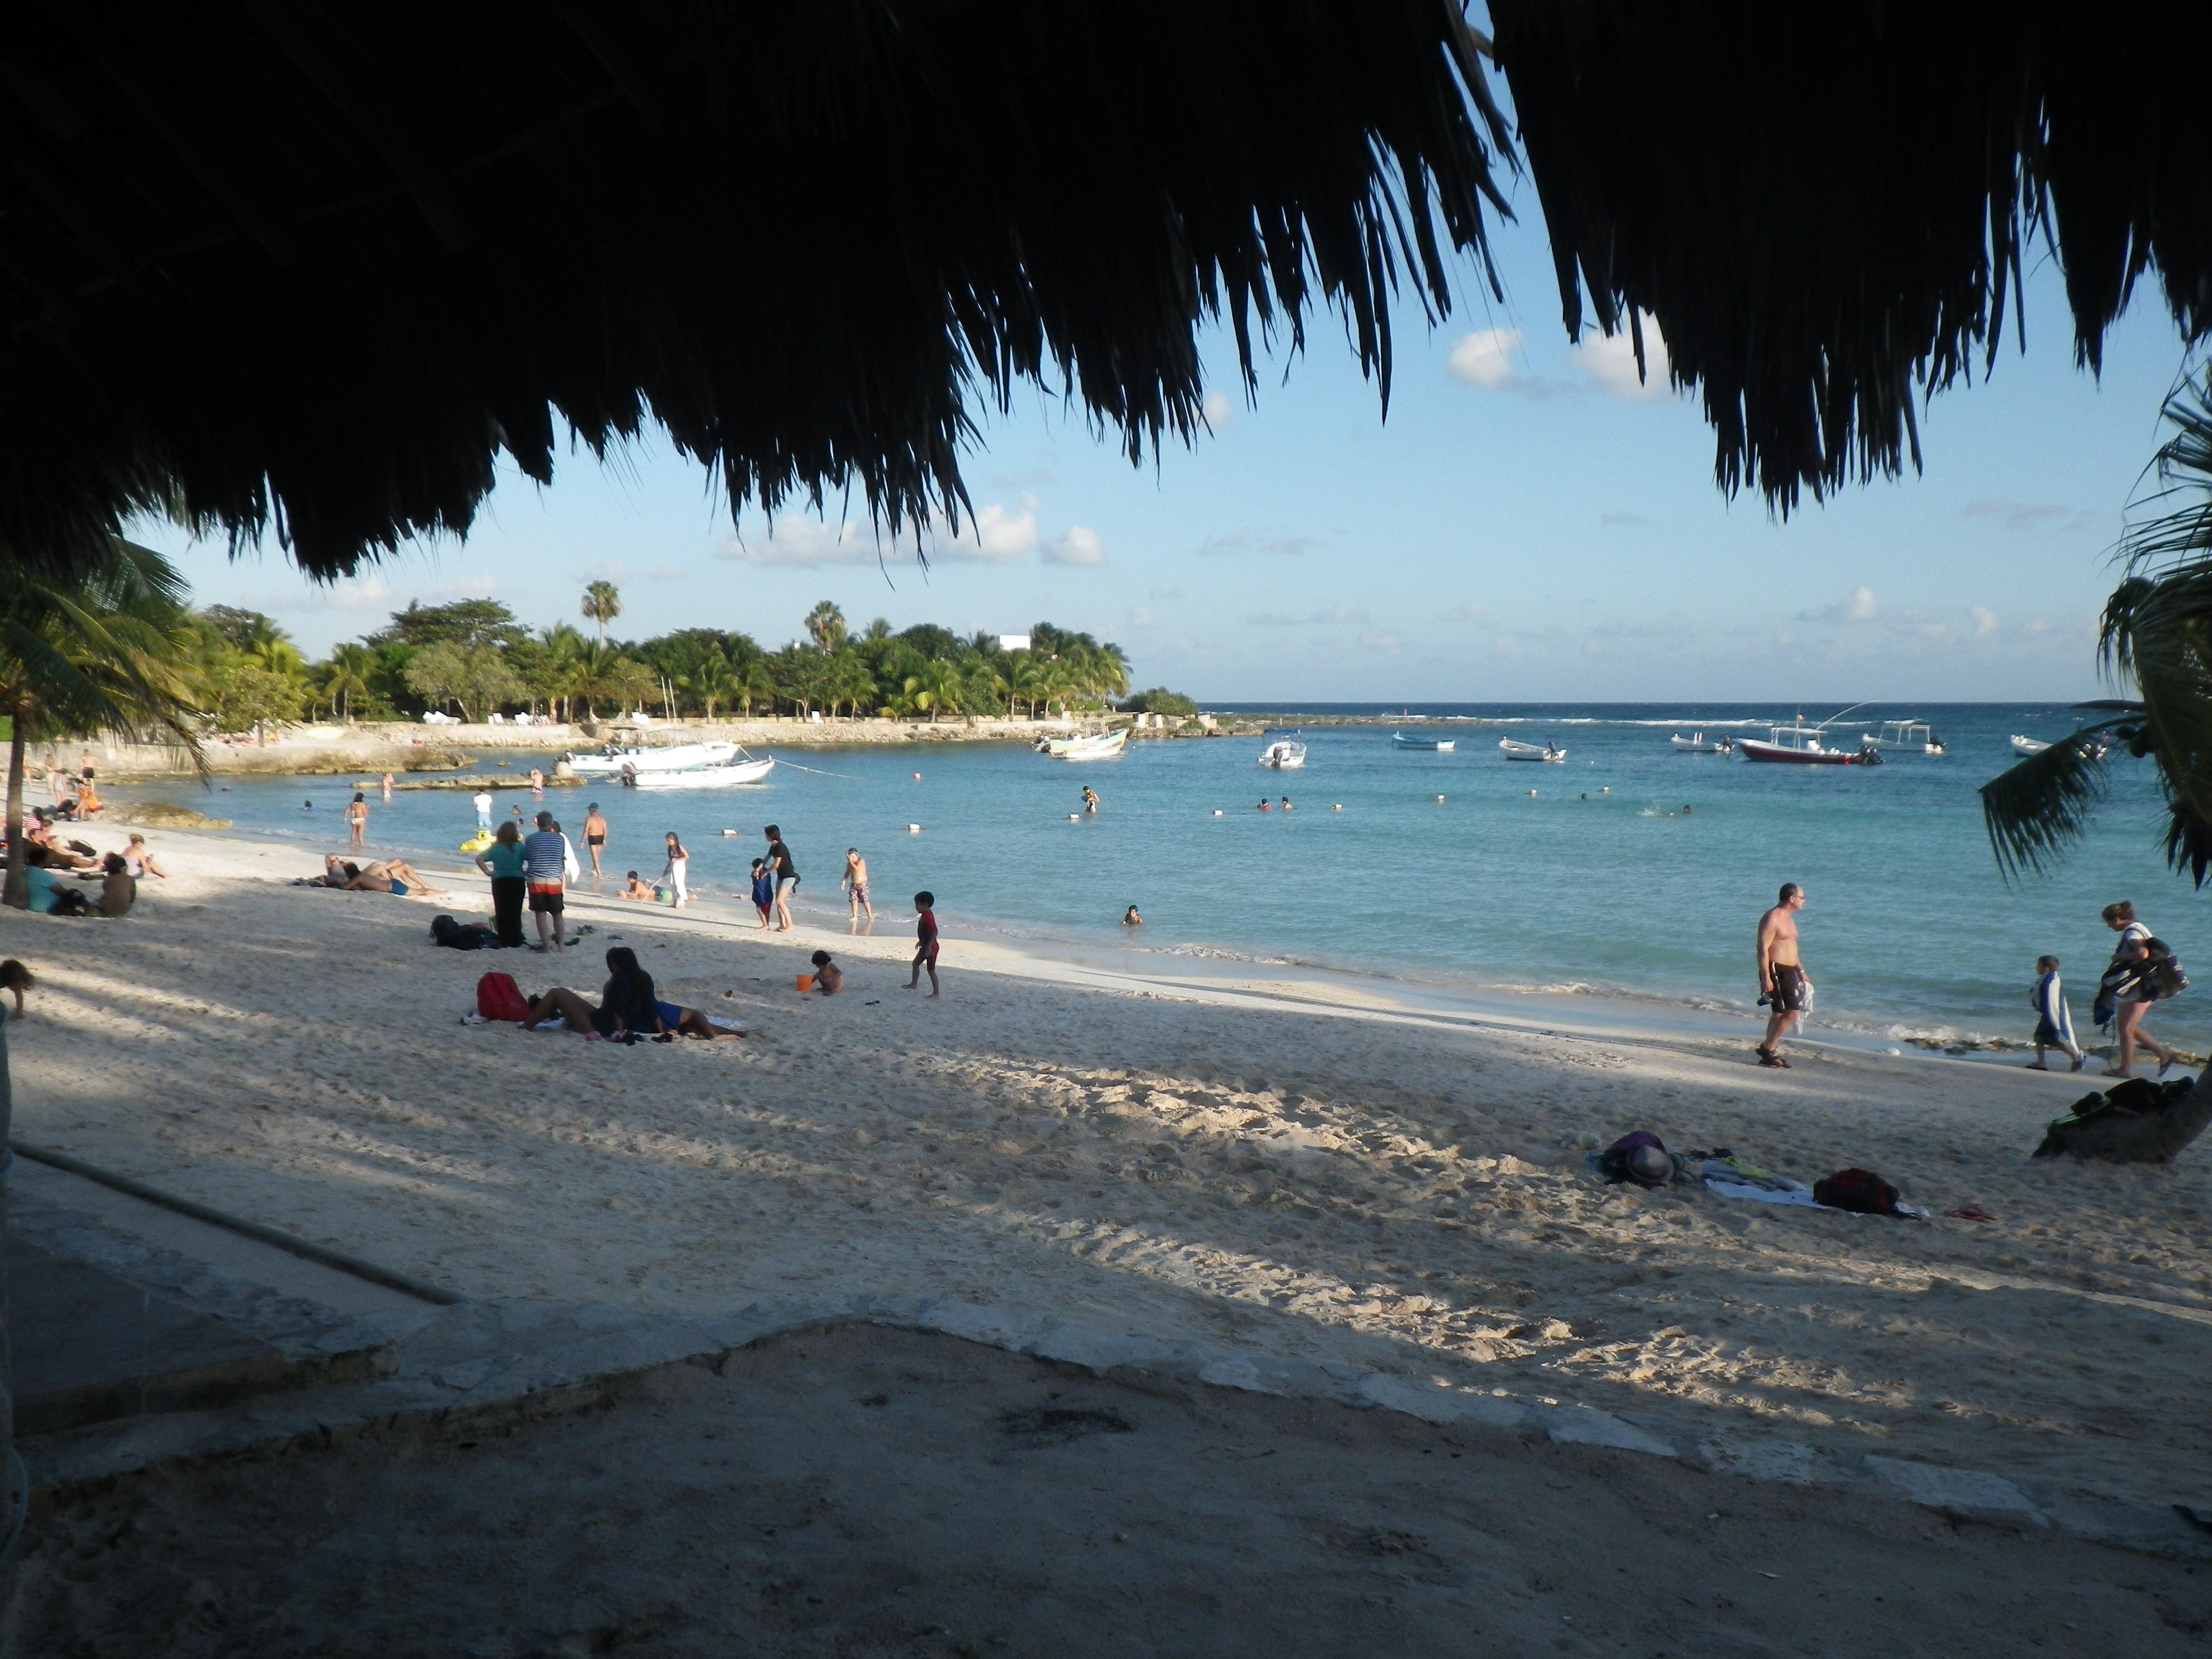 Yucatan, Akumal, Mexico, beaches, travel, expat